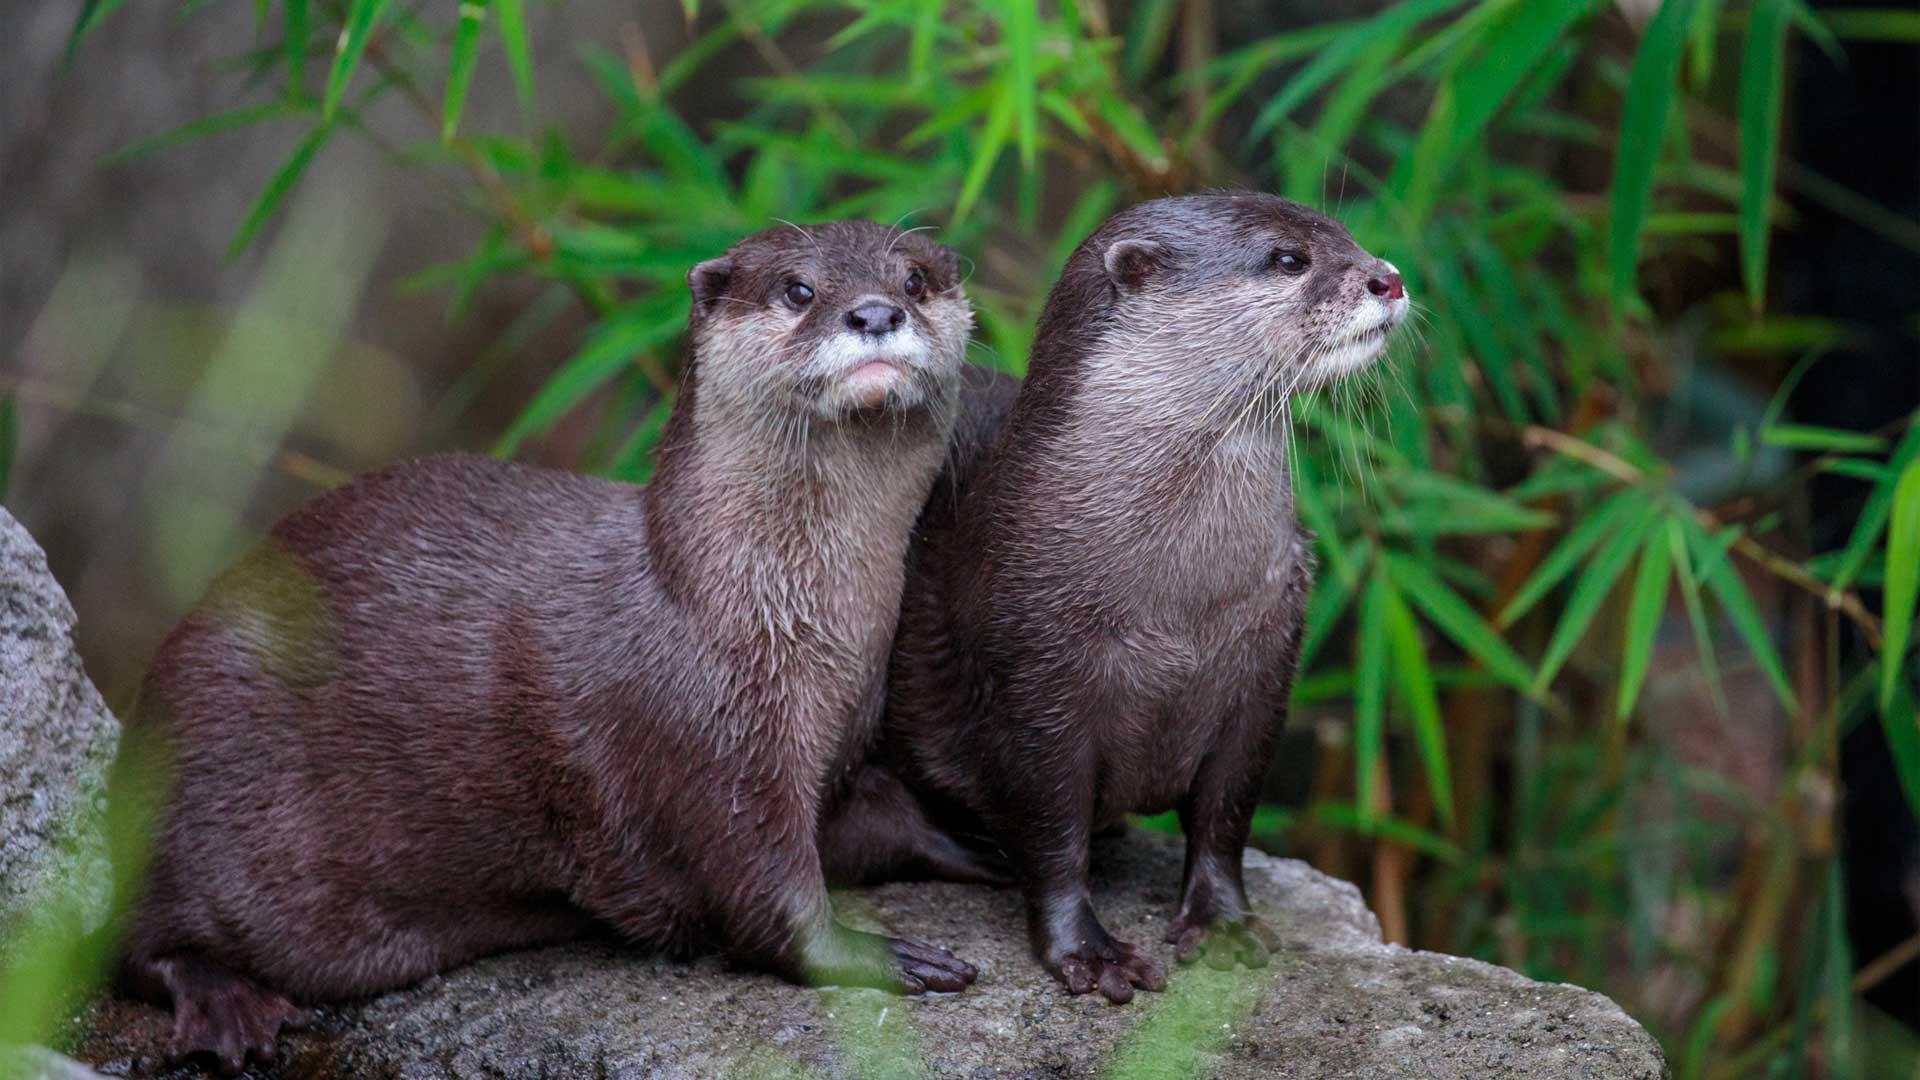 https://rfacdn.nz/zoo/assets/media/otter-gallery-2.jpg